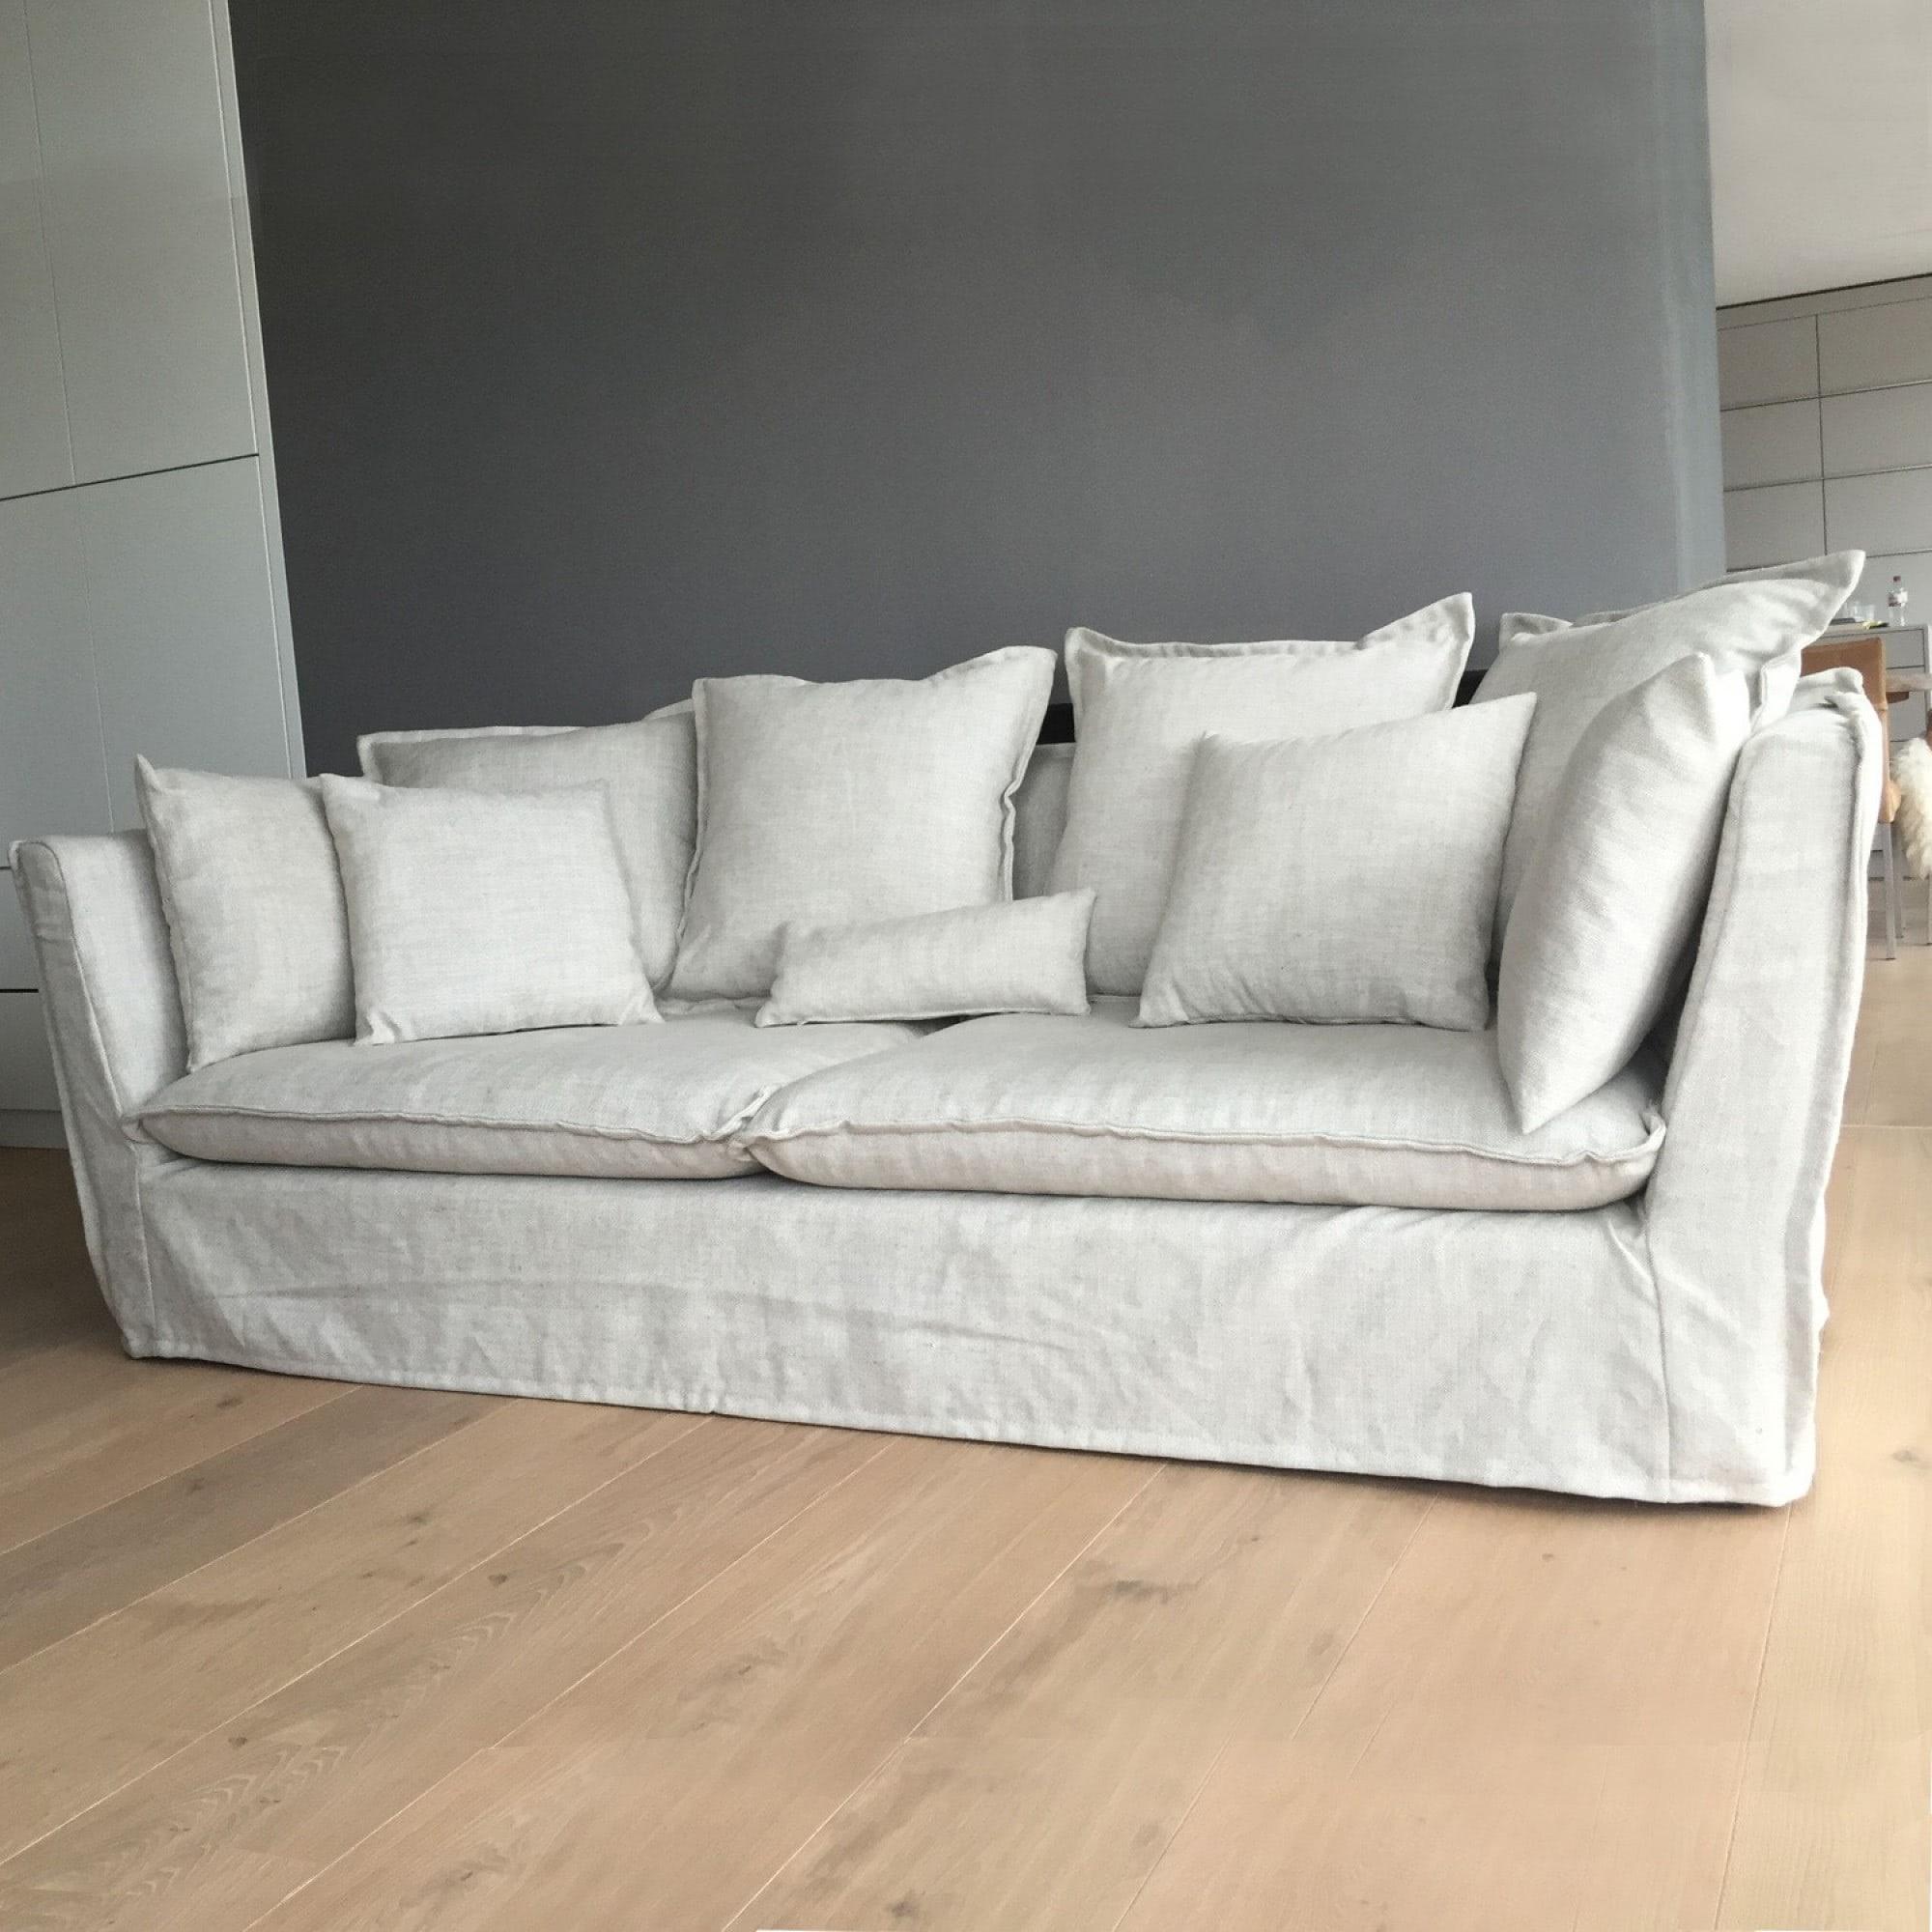 sofa altoona loberon coming home. Black Bedroom Furniture Sets. Home Design Ideas